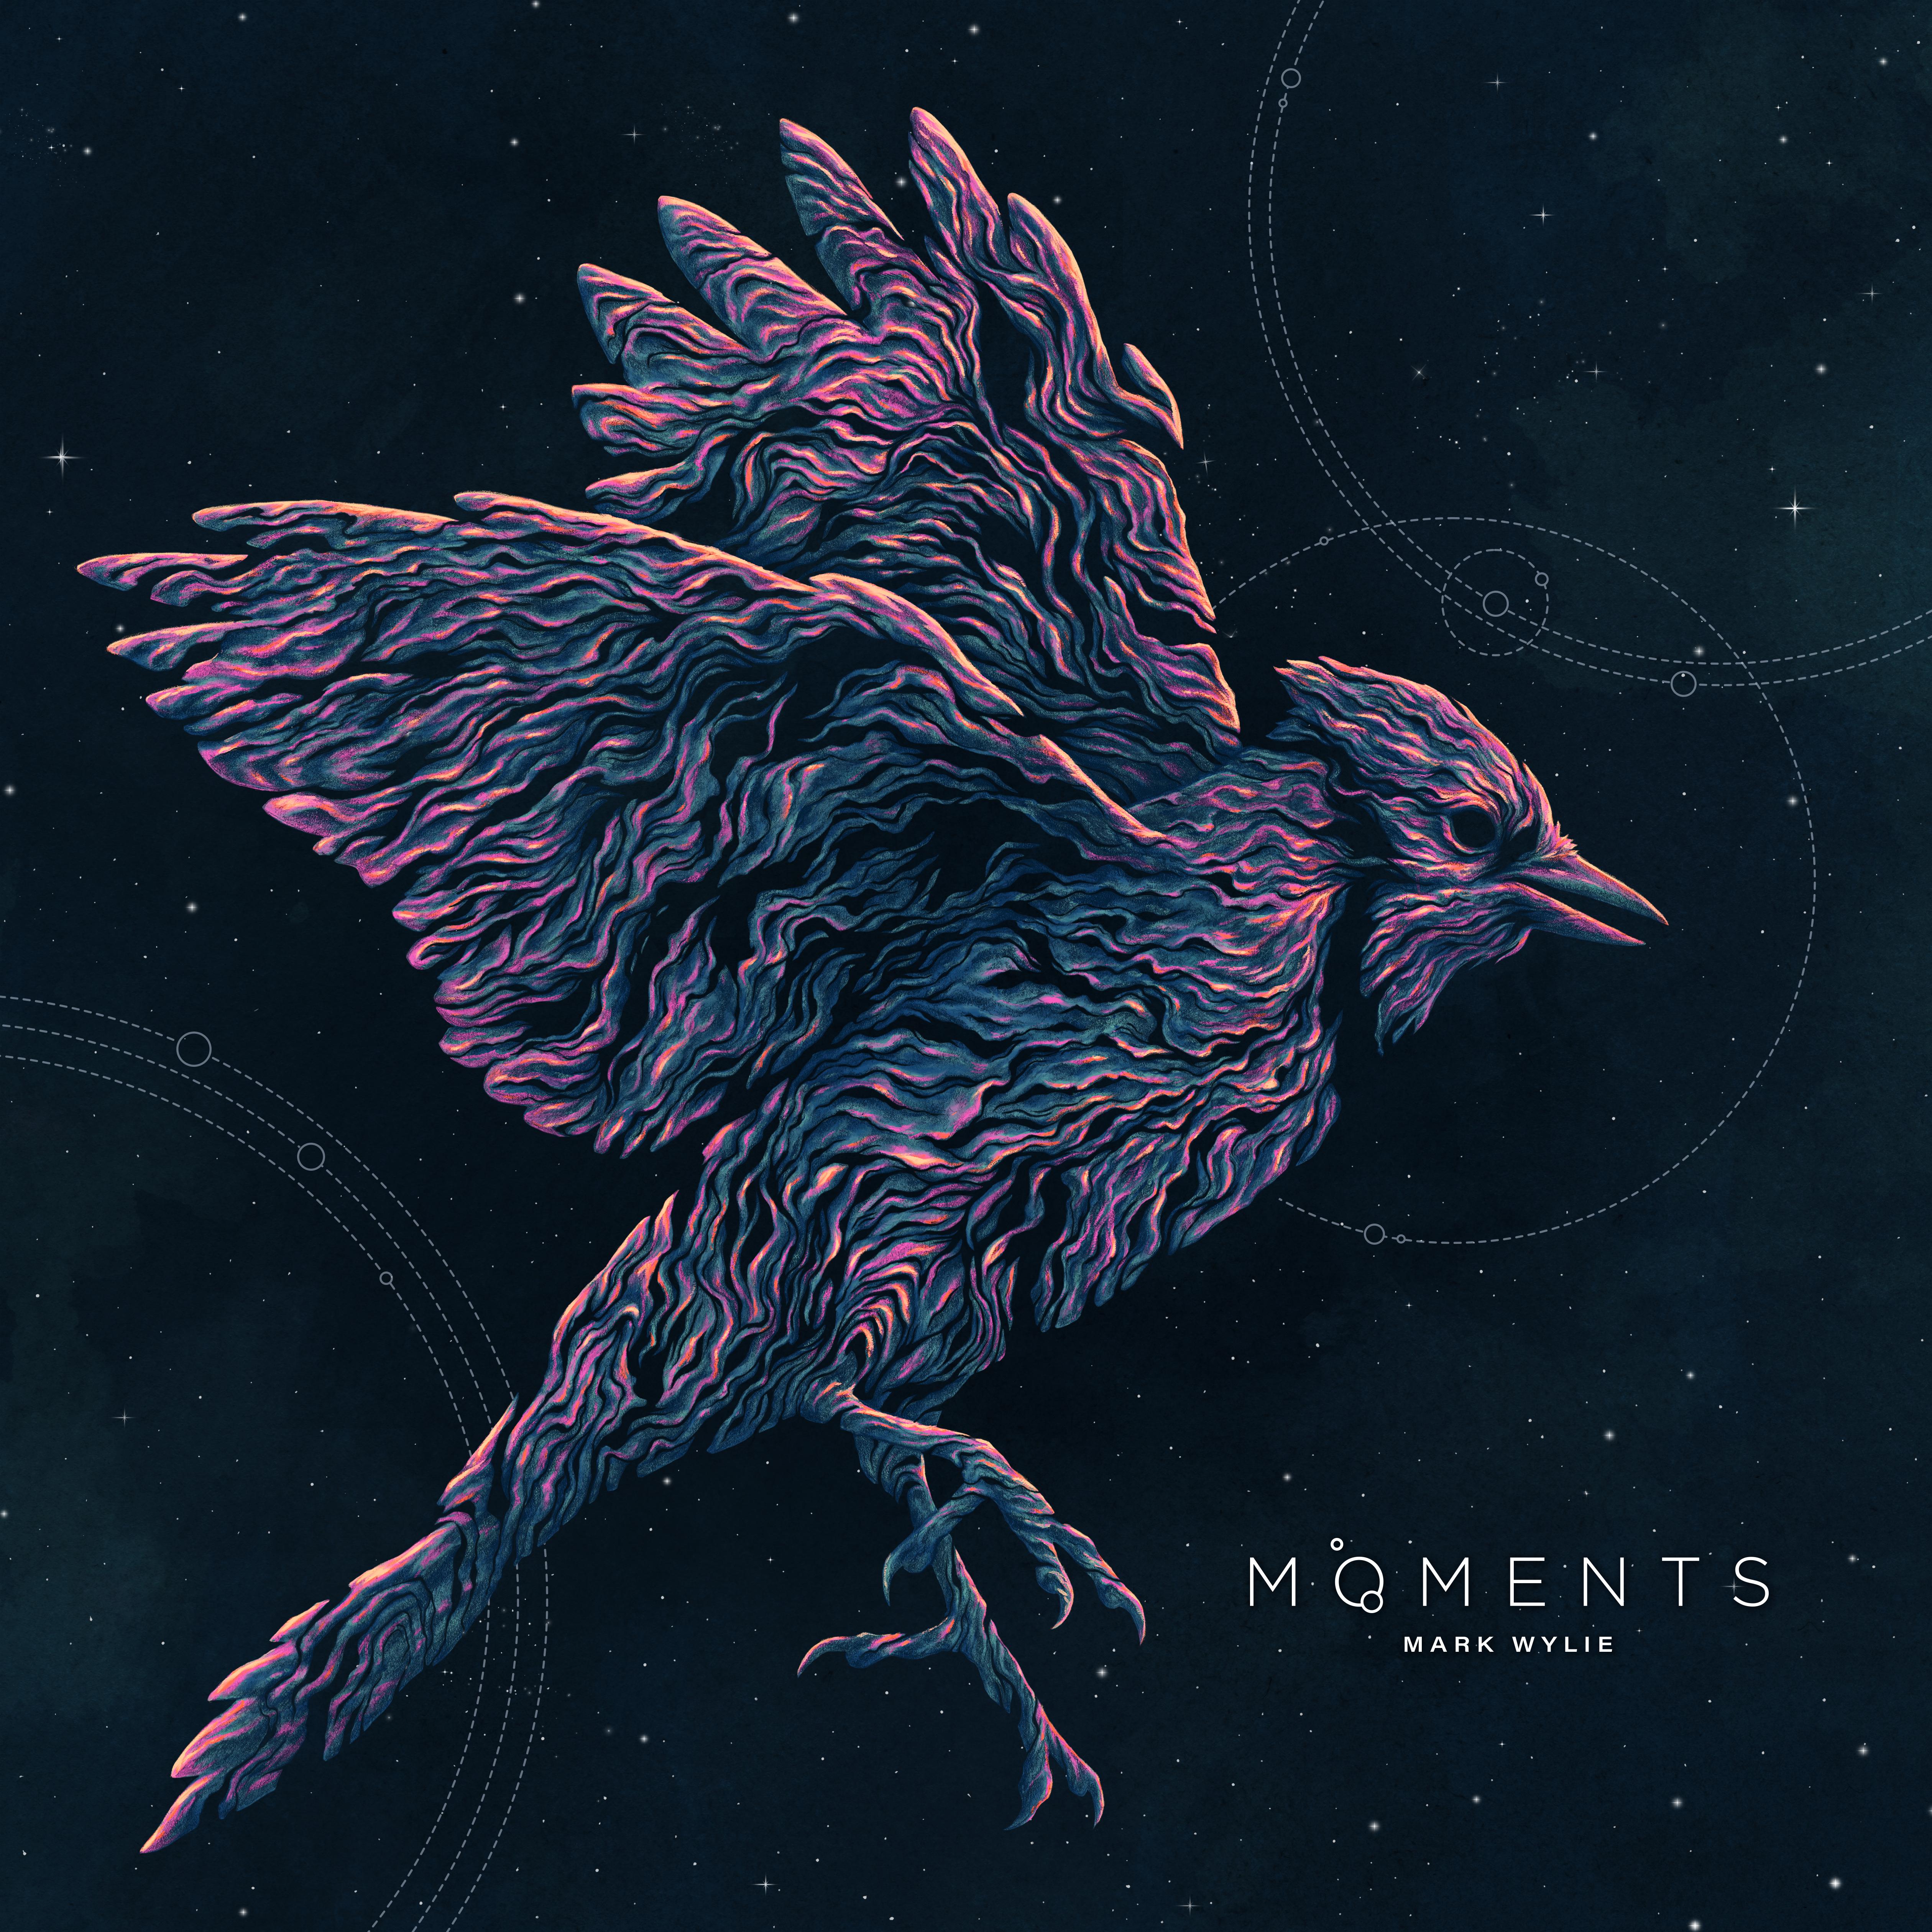 MarkWylie2018-MomentsAlbum-FULL